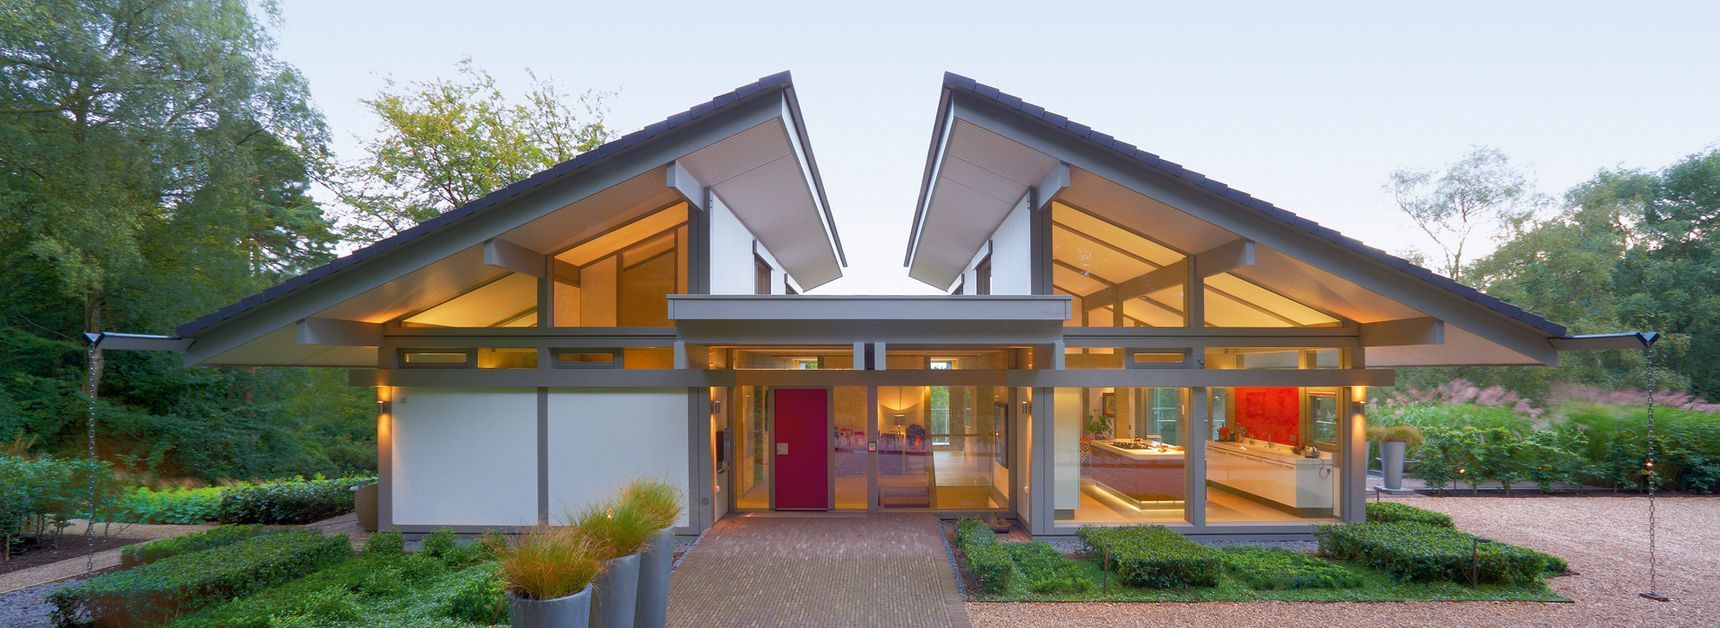 bungalow huf haus art 6 9 das individuelle architektenhaus huf haus dise o interior. Black Bedroom Furniture Sets. Home Design Ideas